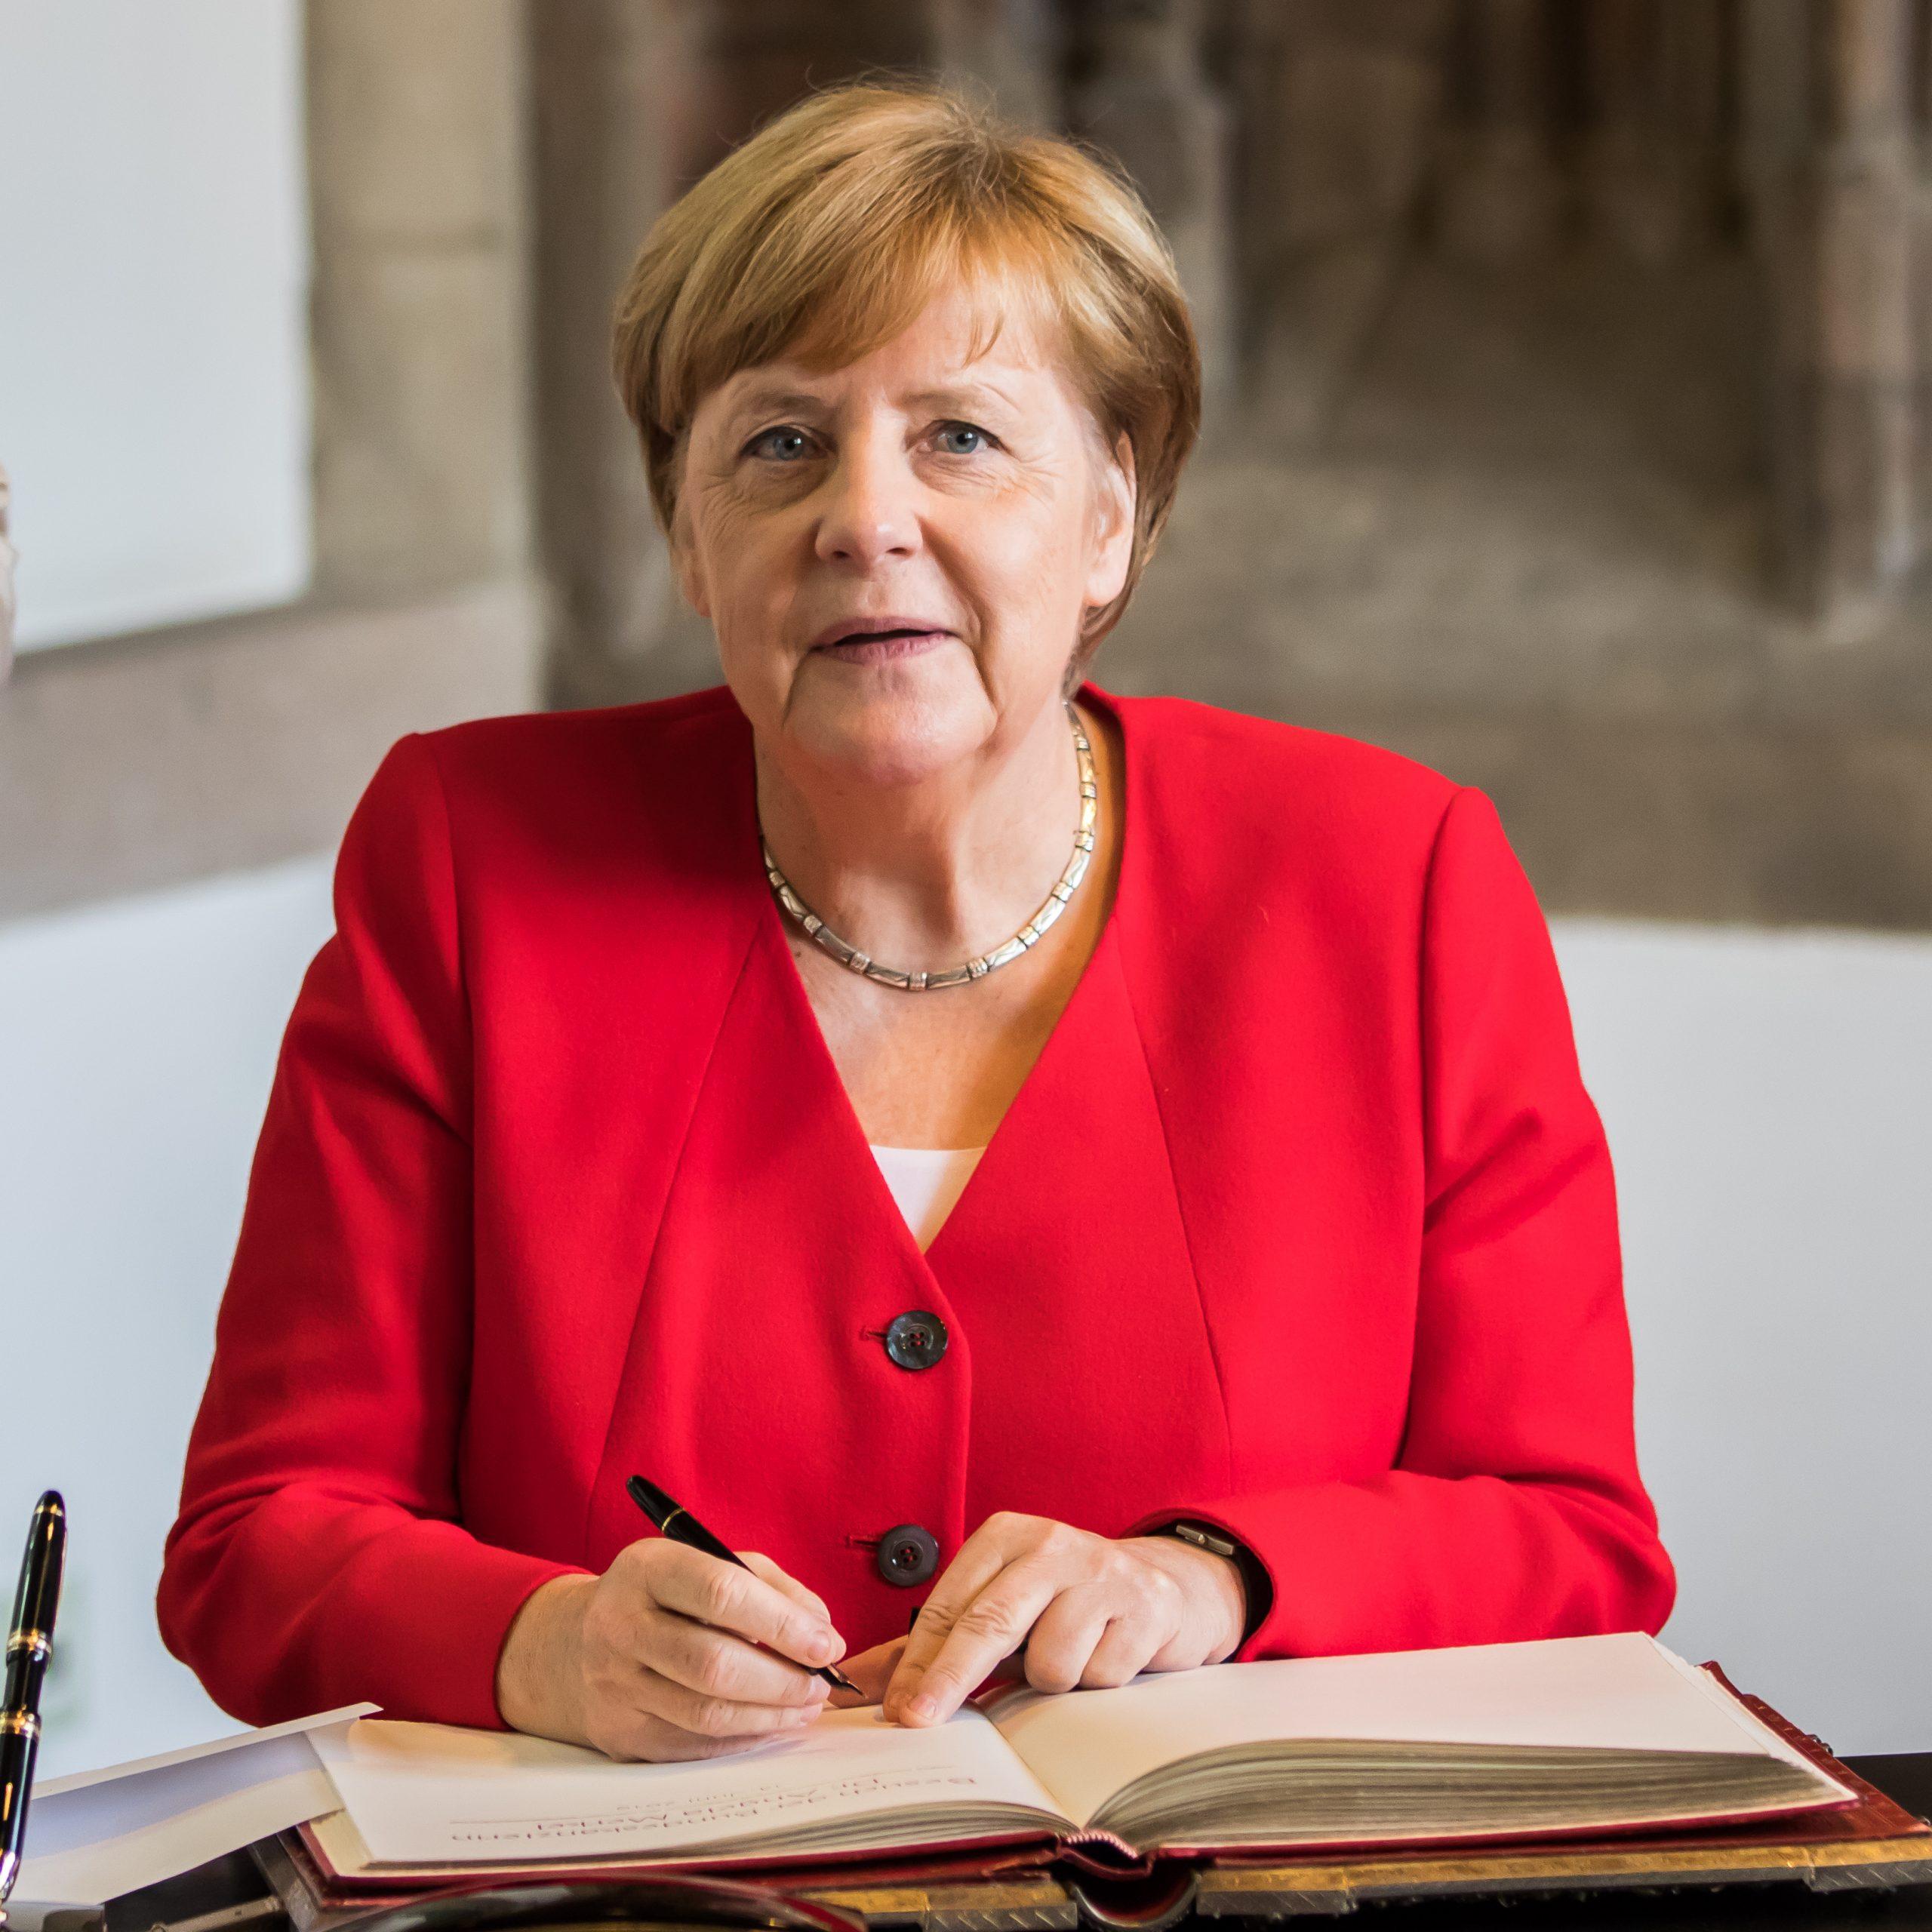 CORONA REDE AN DIE NATION: Kanzlerin Merkel